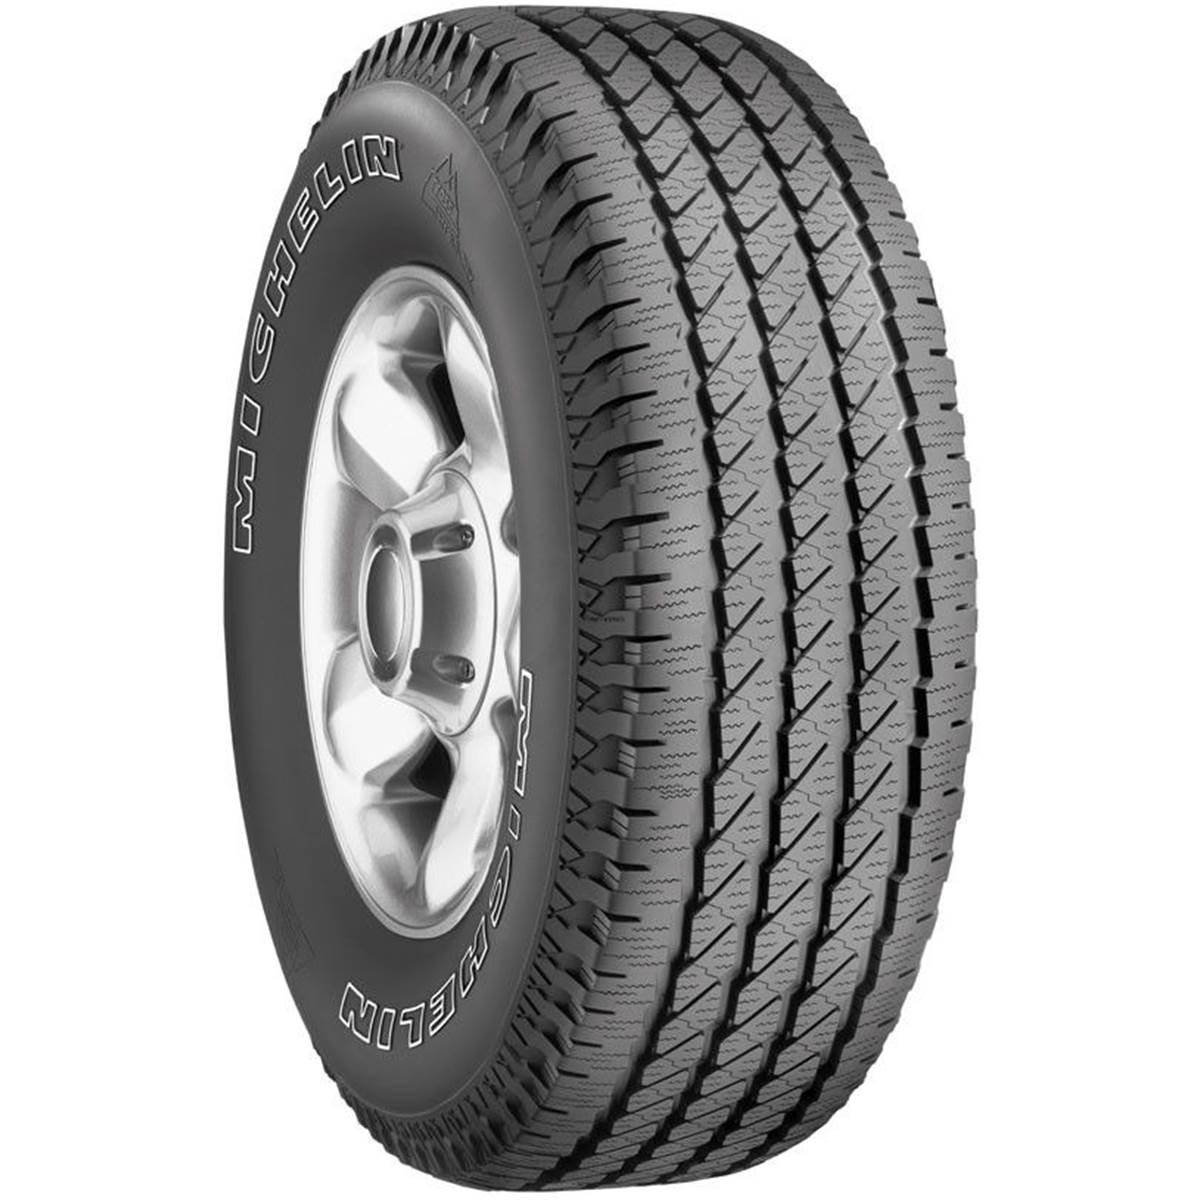 michelin 4x4 o r achat de pneus michelin 4x4 o r pas cher comparer les prix du pneu michelin. Black Bedroom Furniture Sets. Home Design Ideas